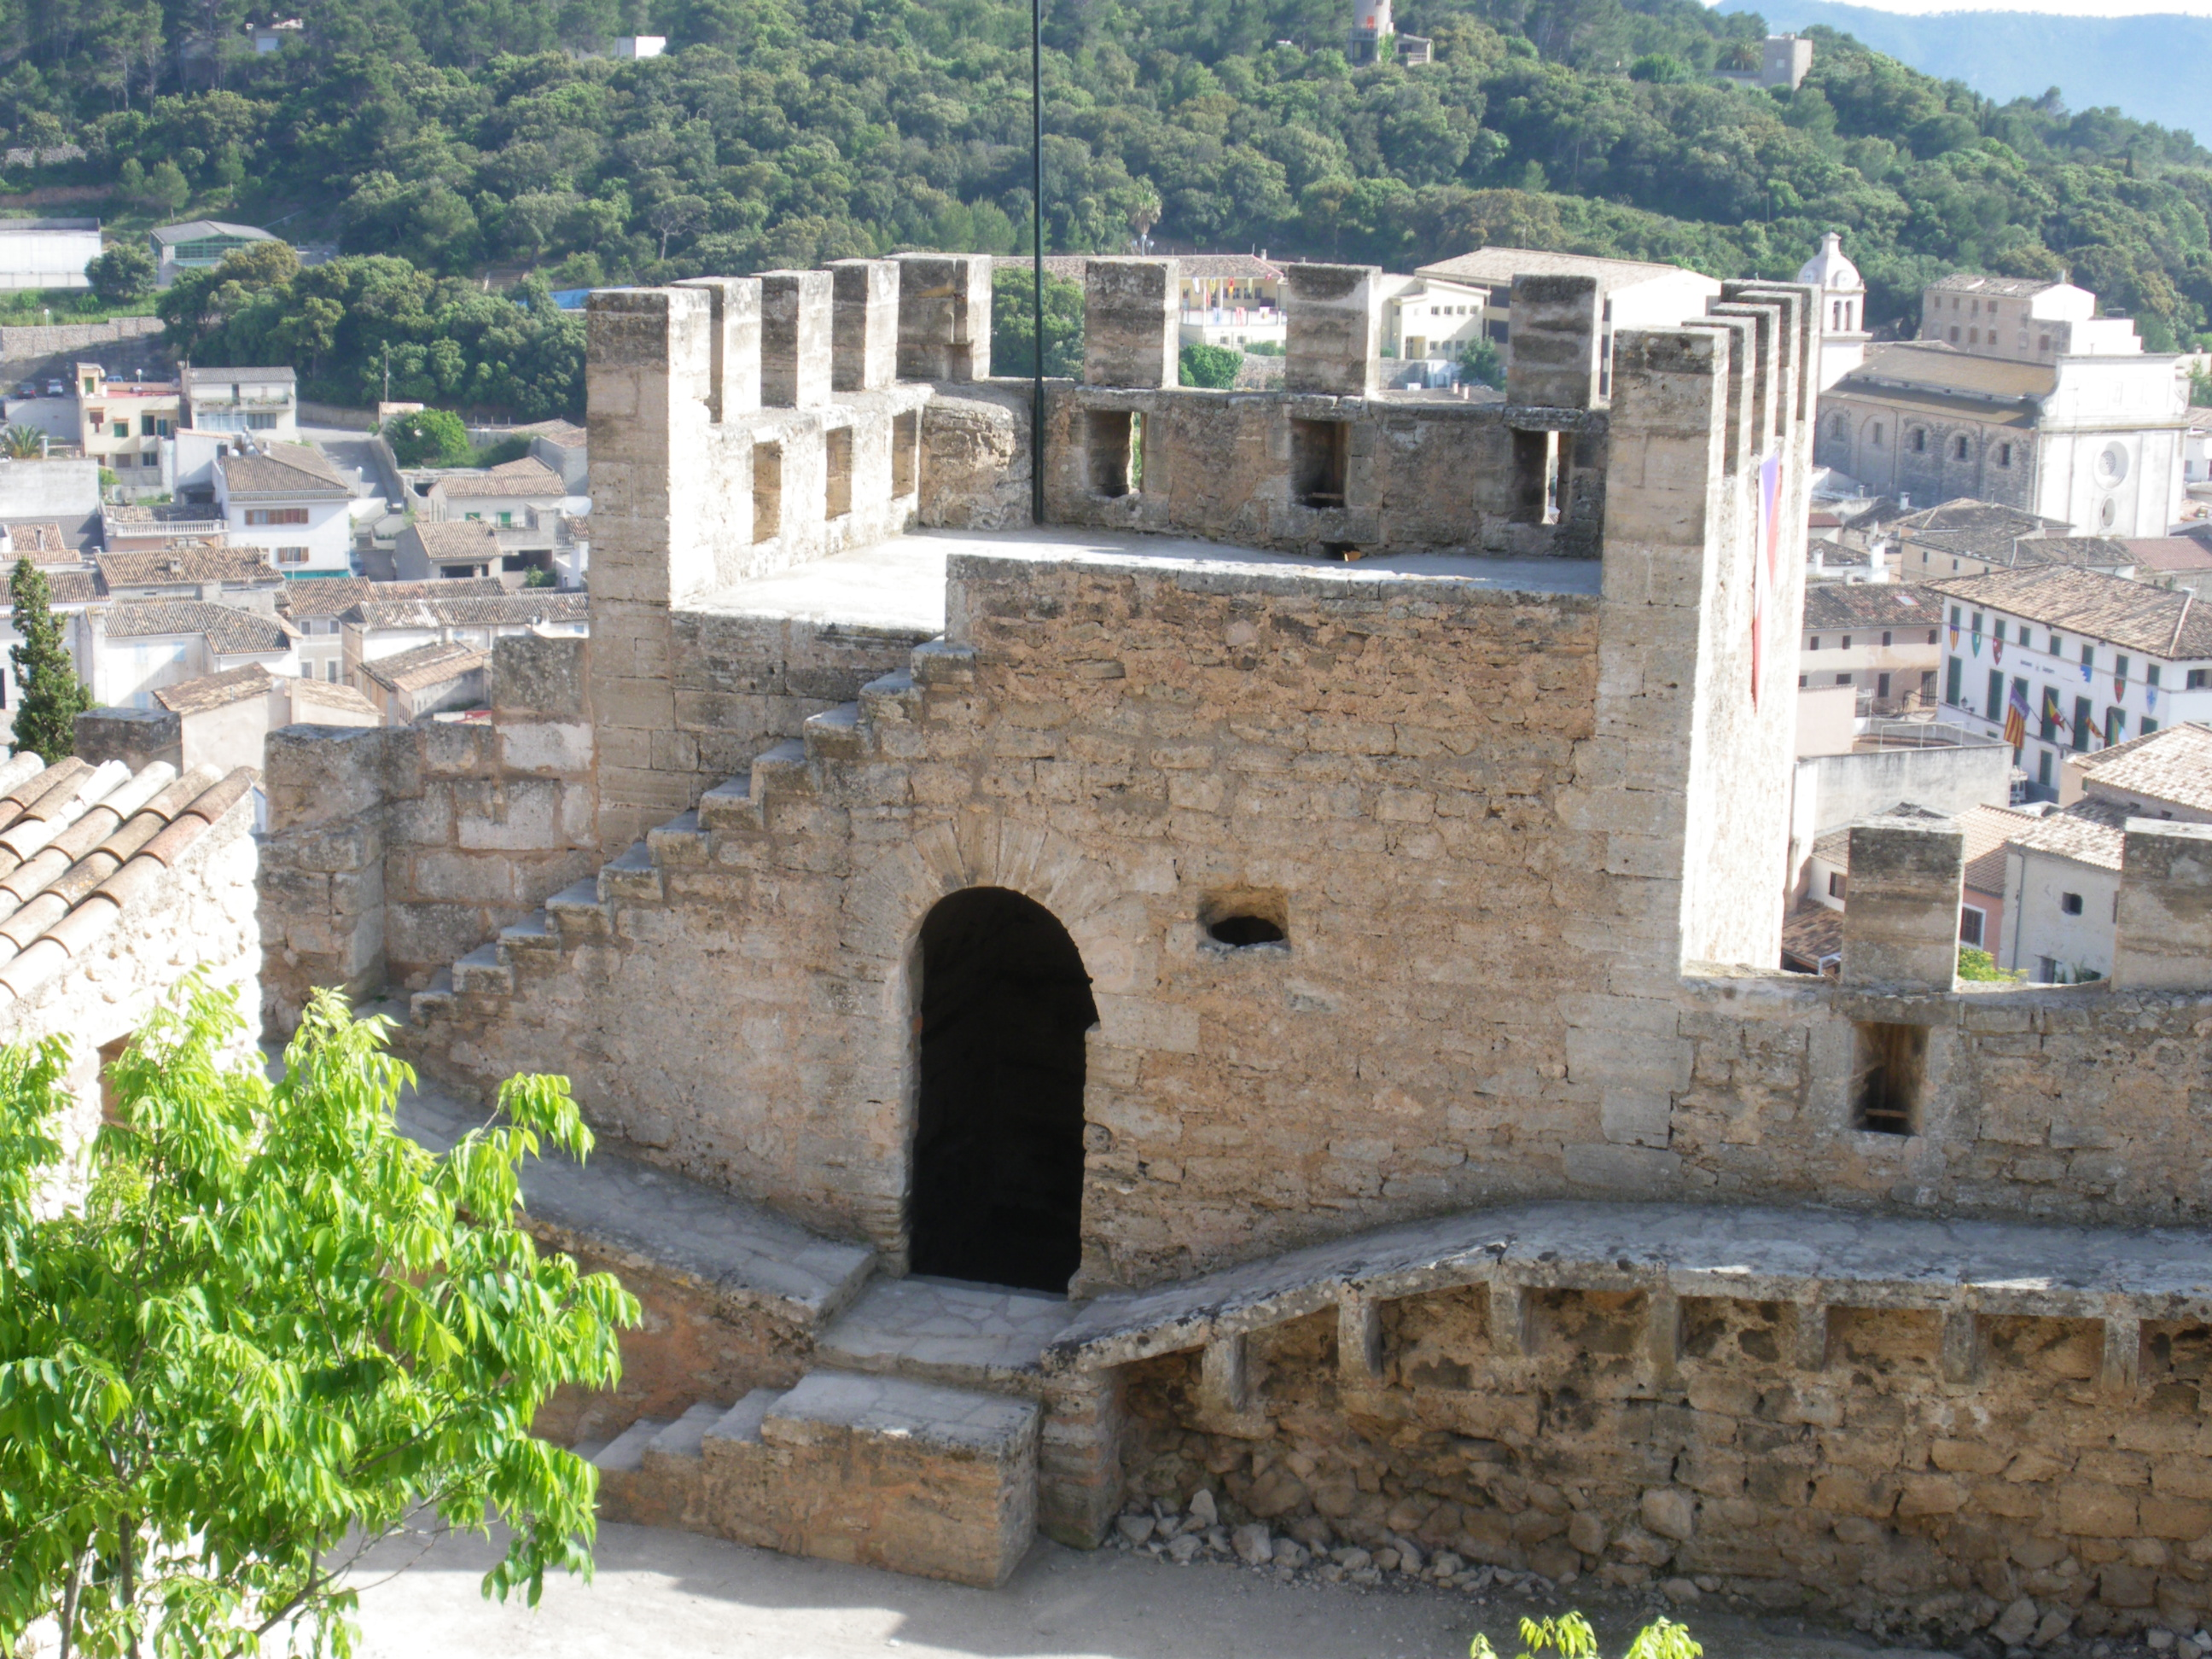 File:Tower Castell de Capdepera.jpg - Wikimedia Commons